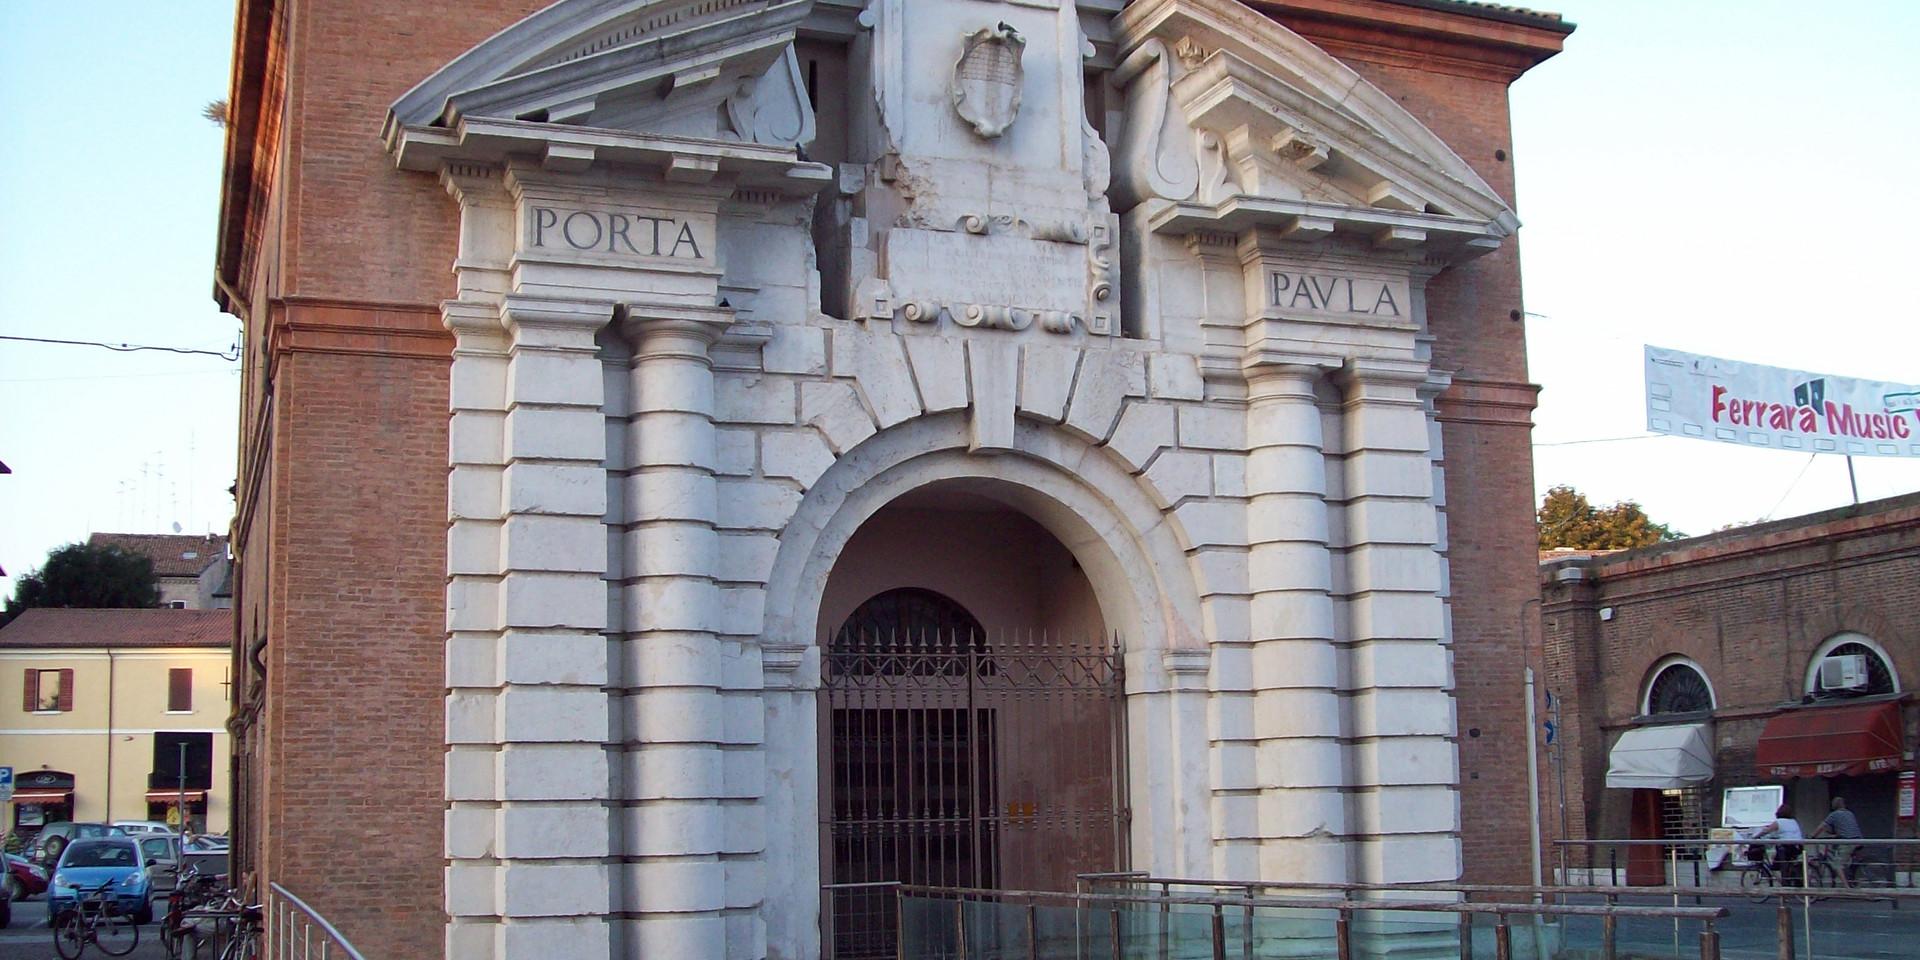 PORTA PAOLA, FERRARA